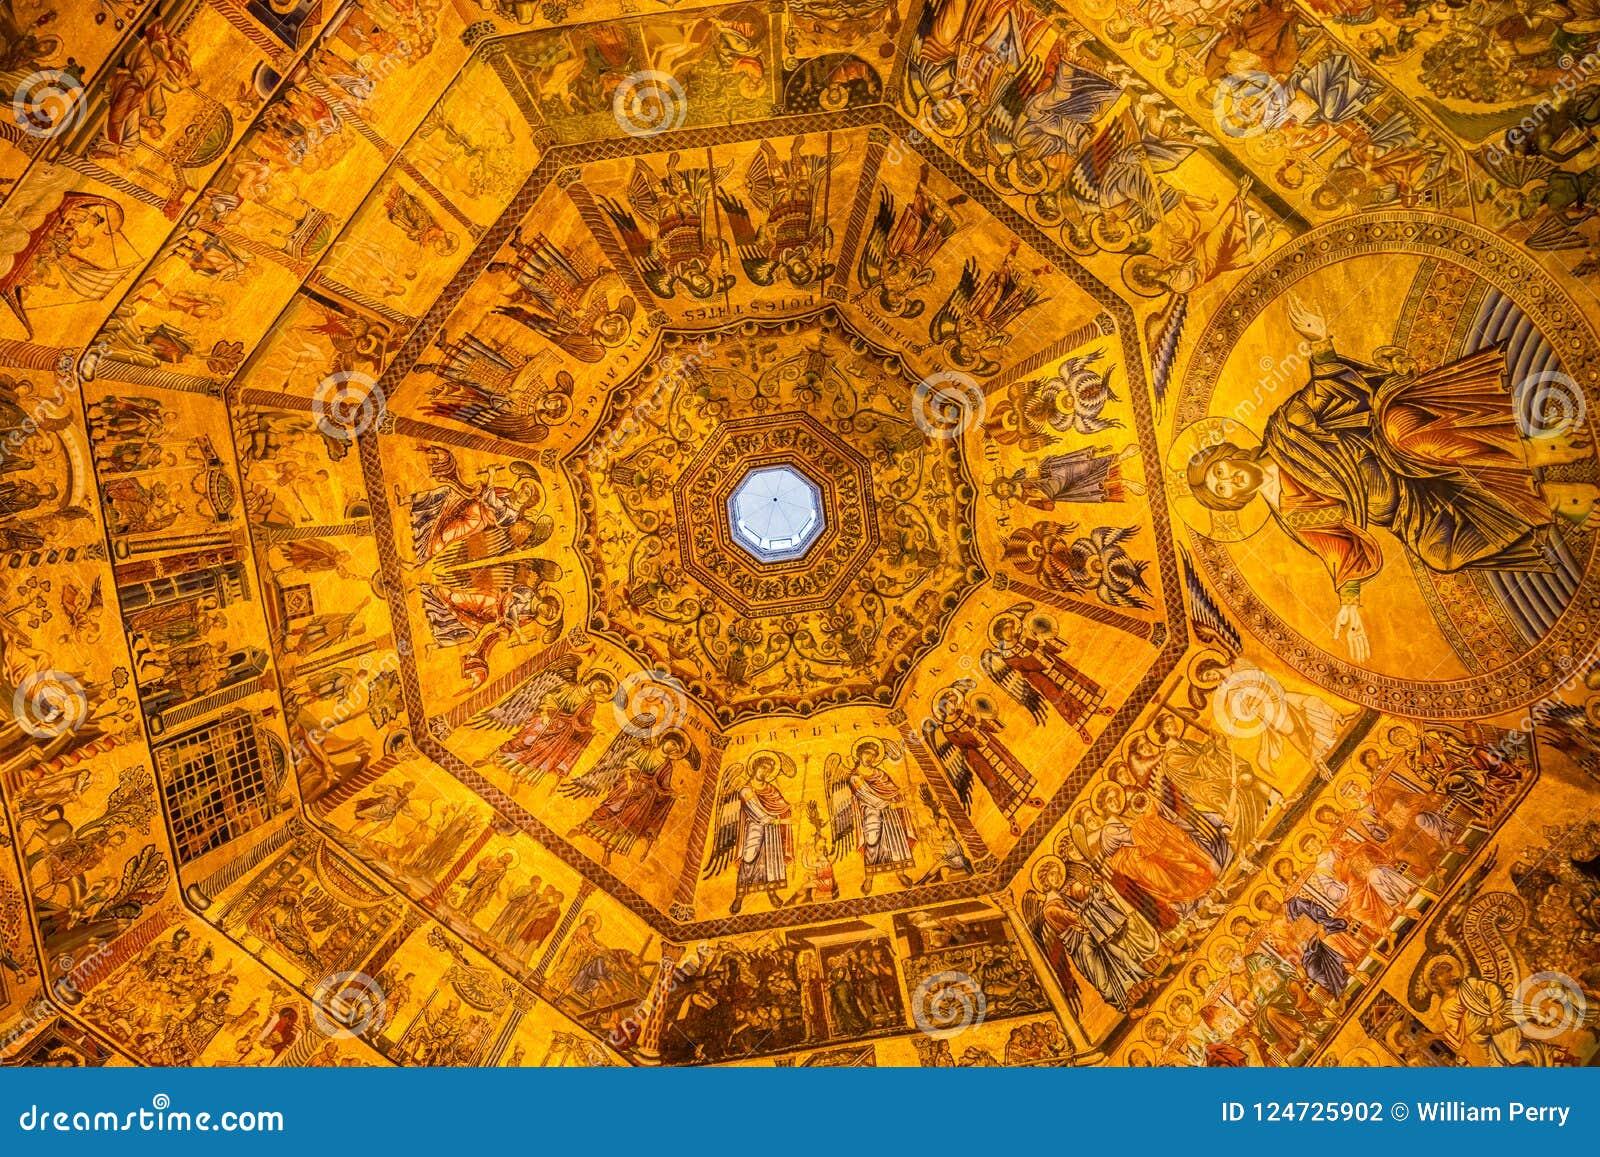 Jesus Christ Angels Mosaic Dome Bapistry Heilige John Florence Ita